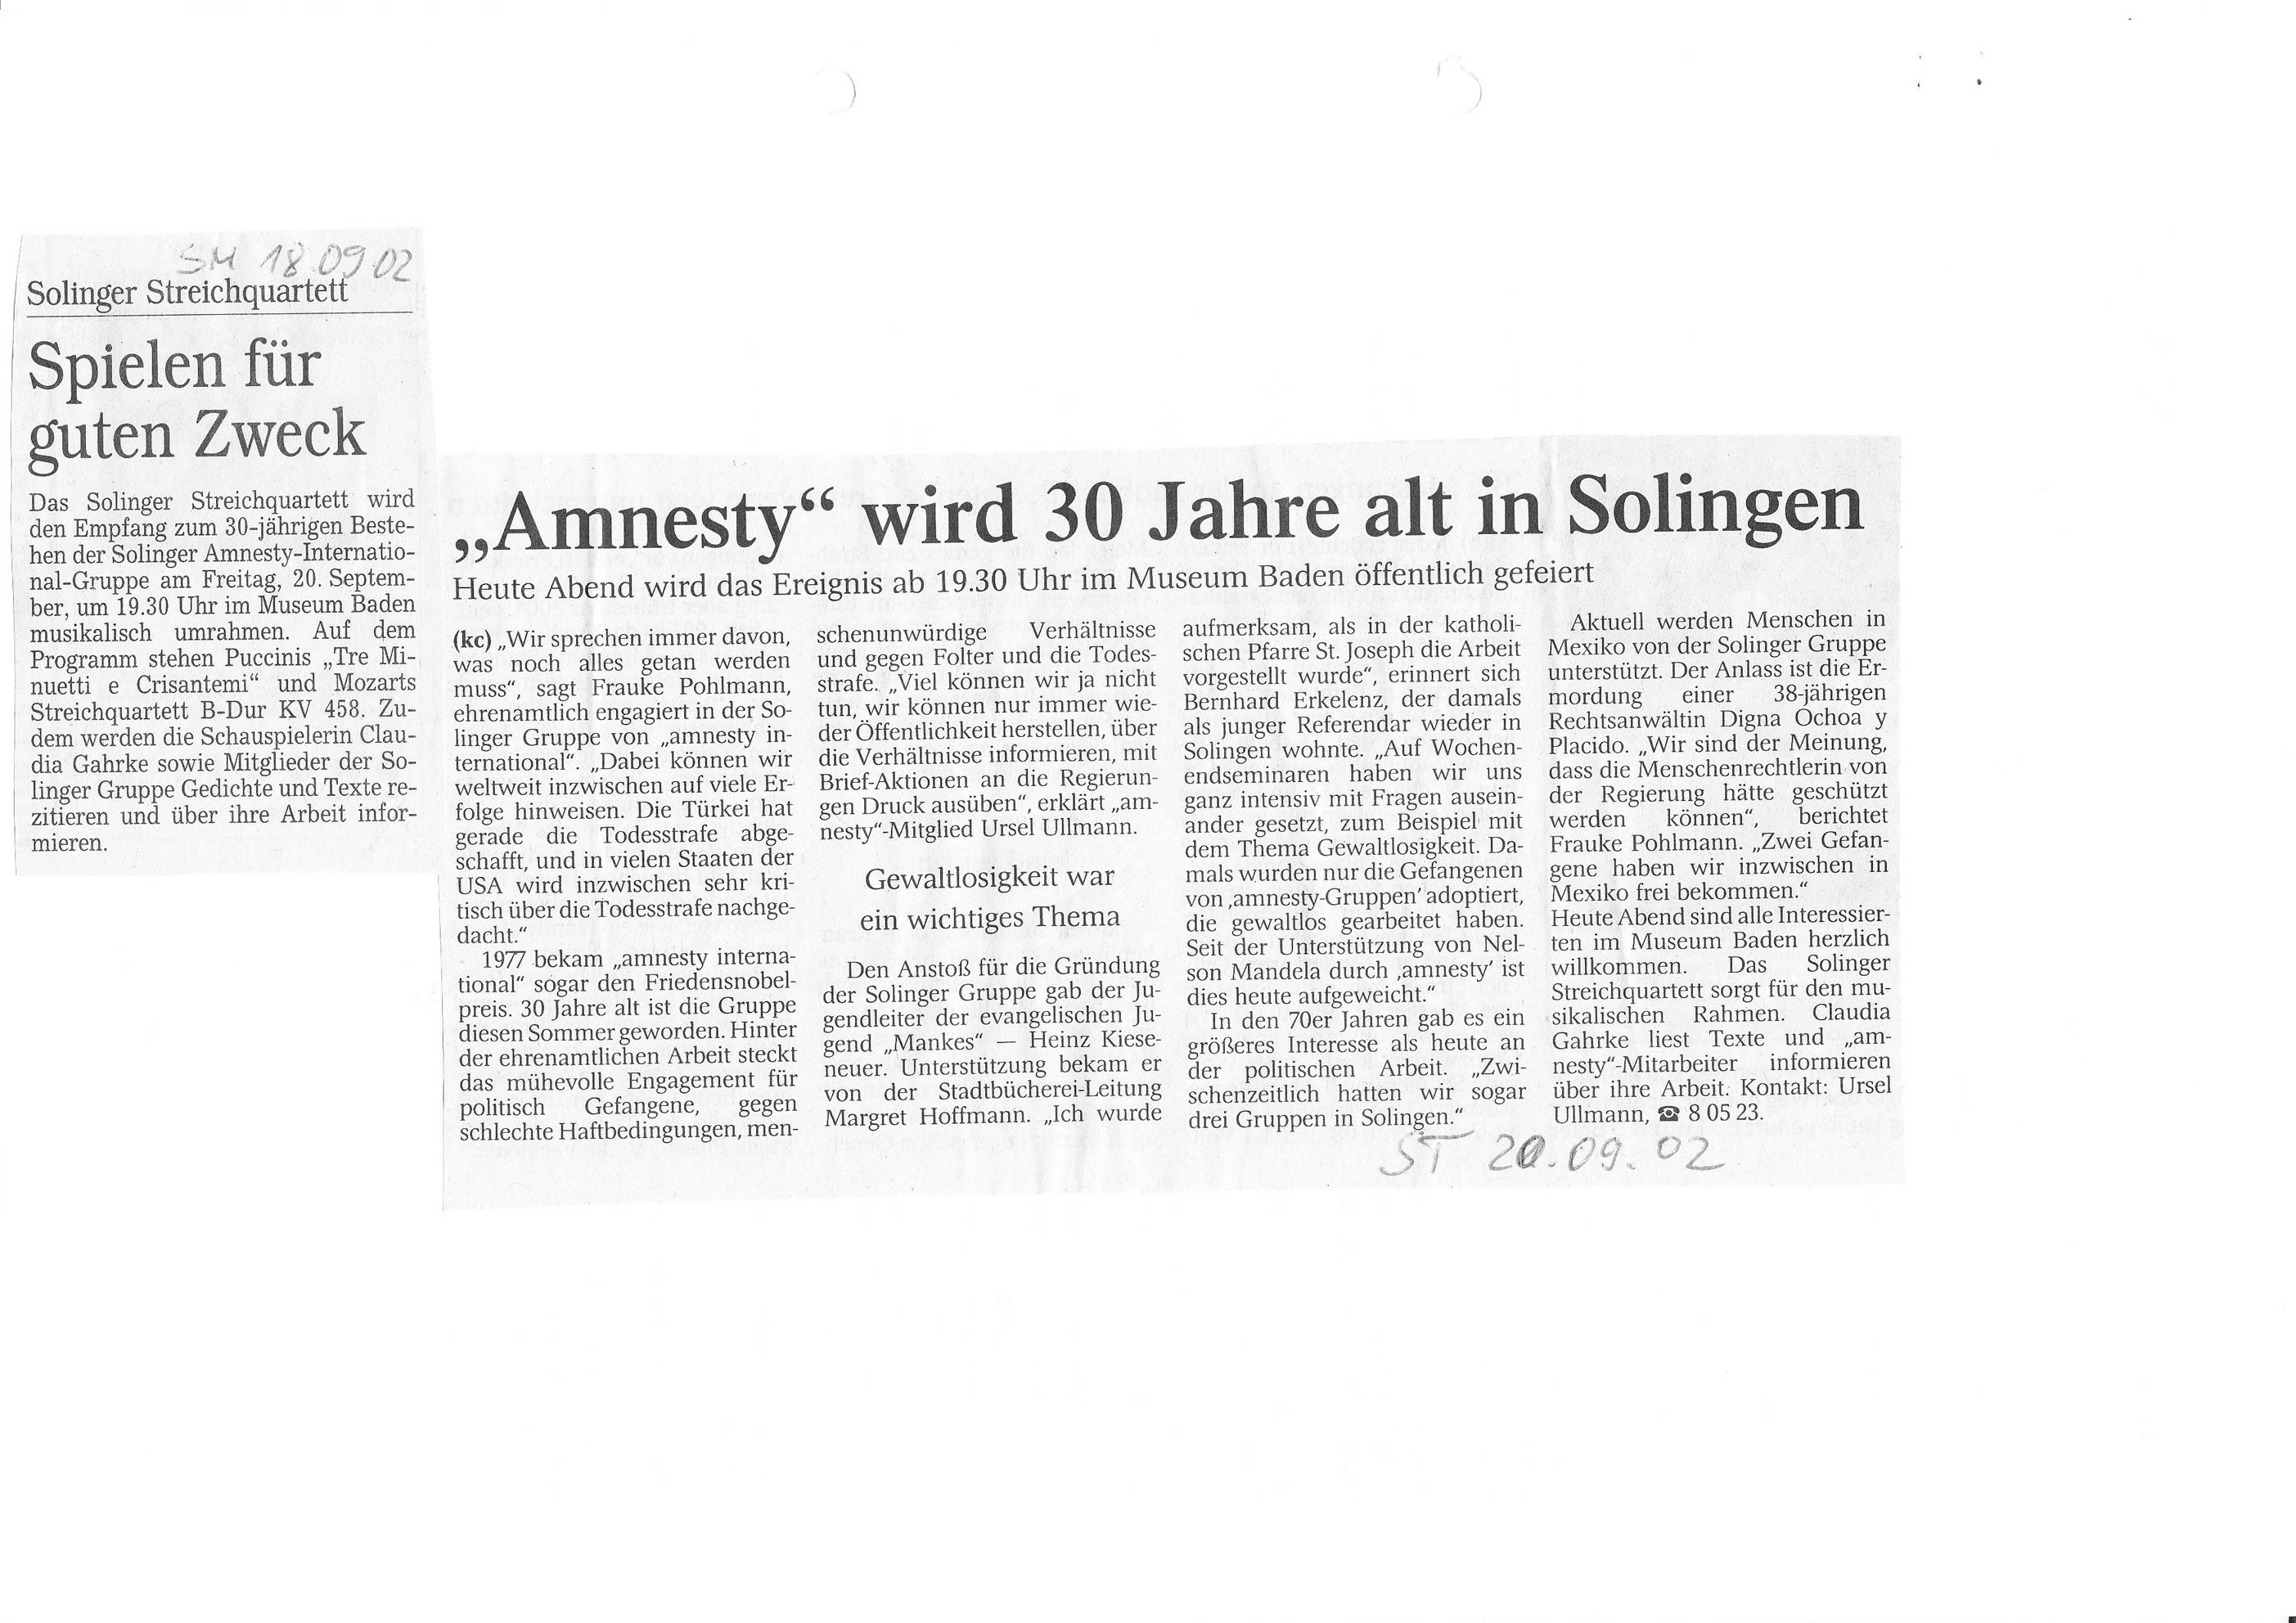 Solinger Tageblatt 09/02: 30 Jahre ai-Gruppe Solingen